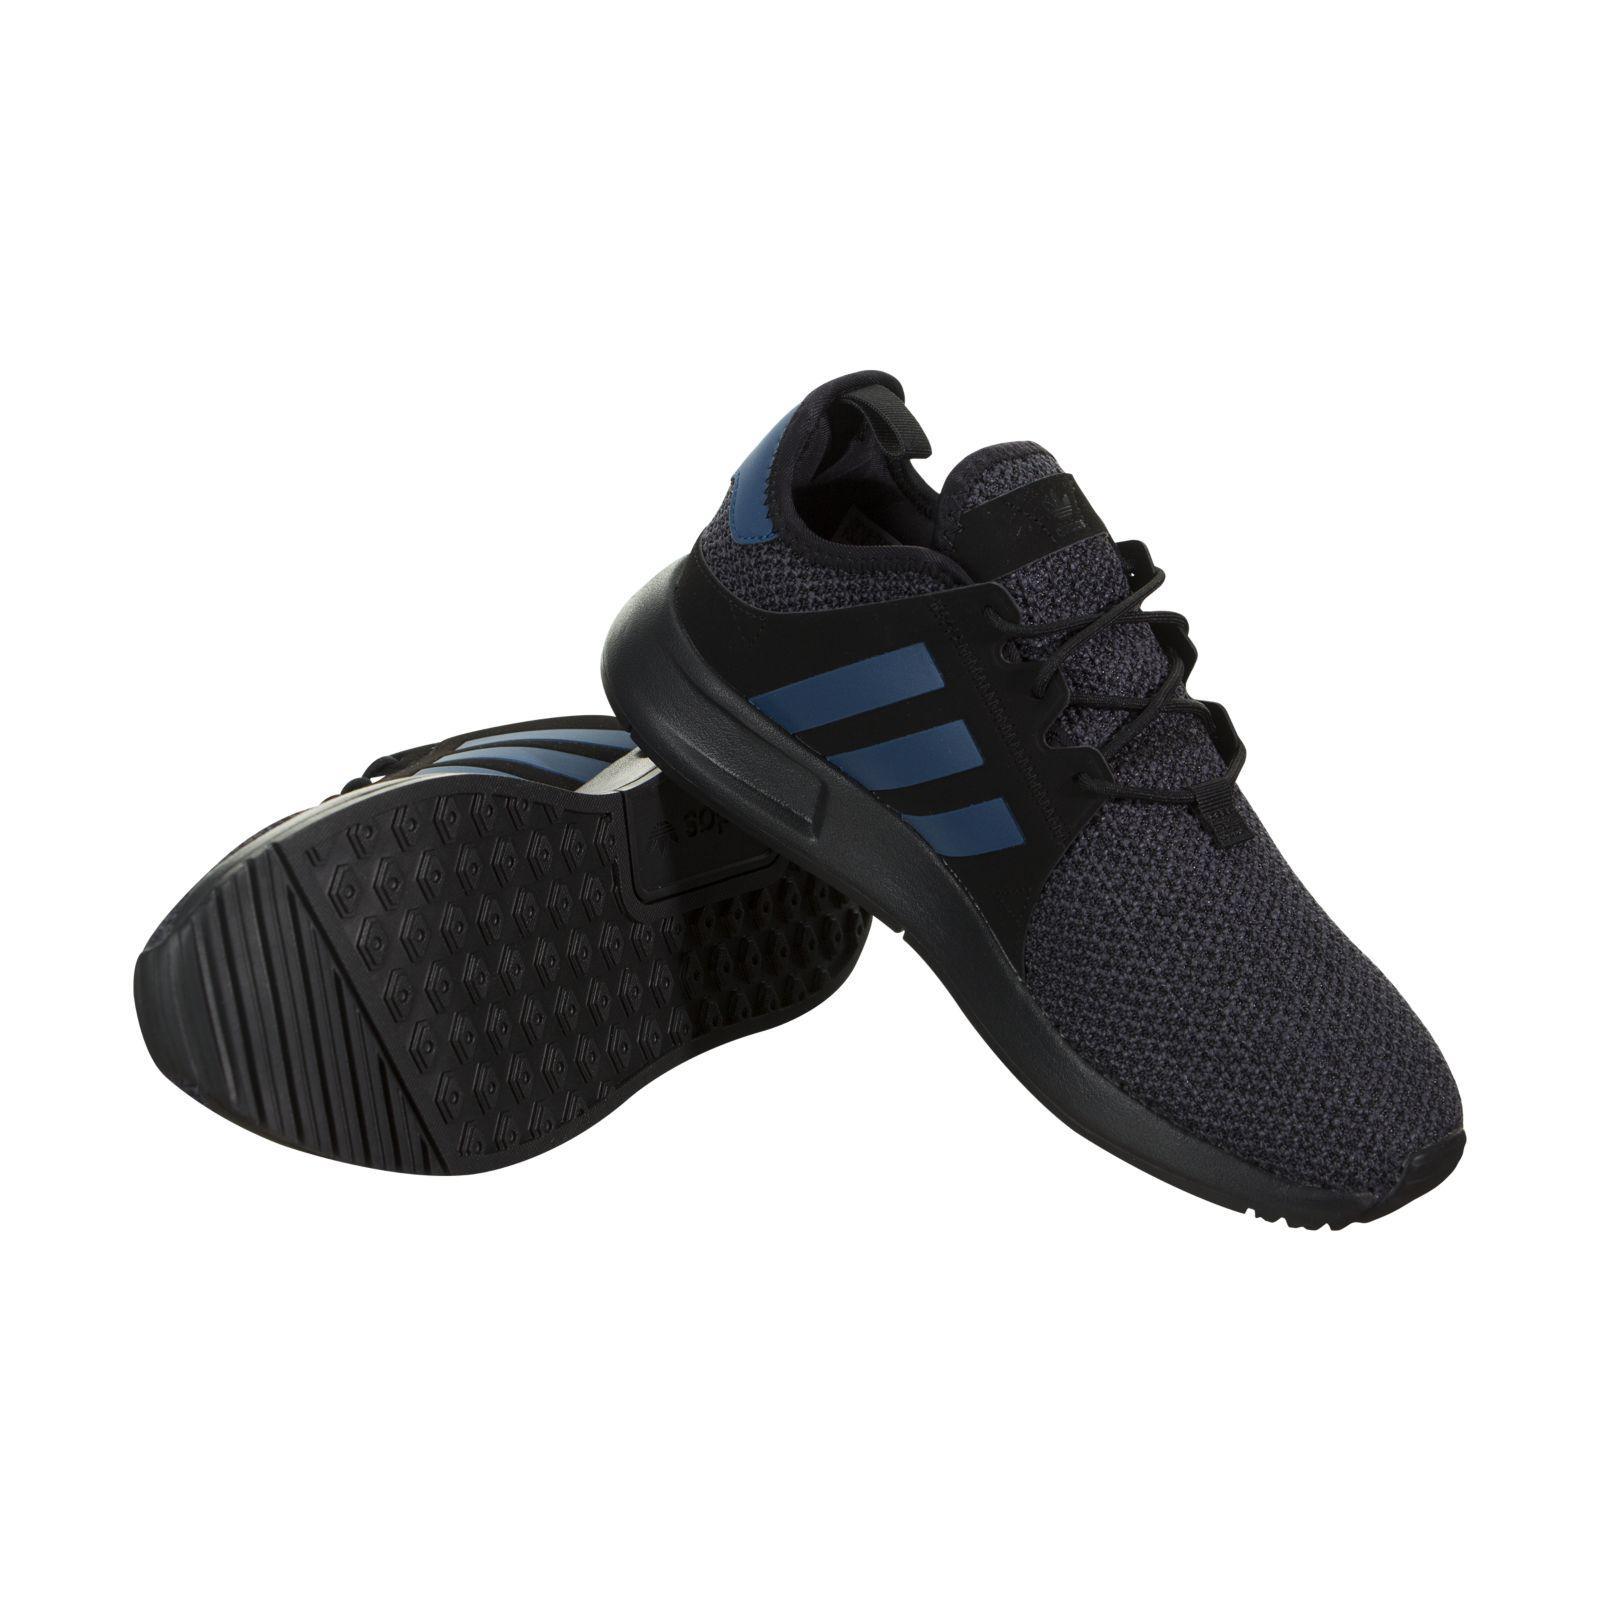 5735f8c50e61 Adidas X PLR Two-Tone Knit (Kids) cm7352